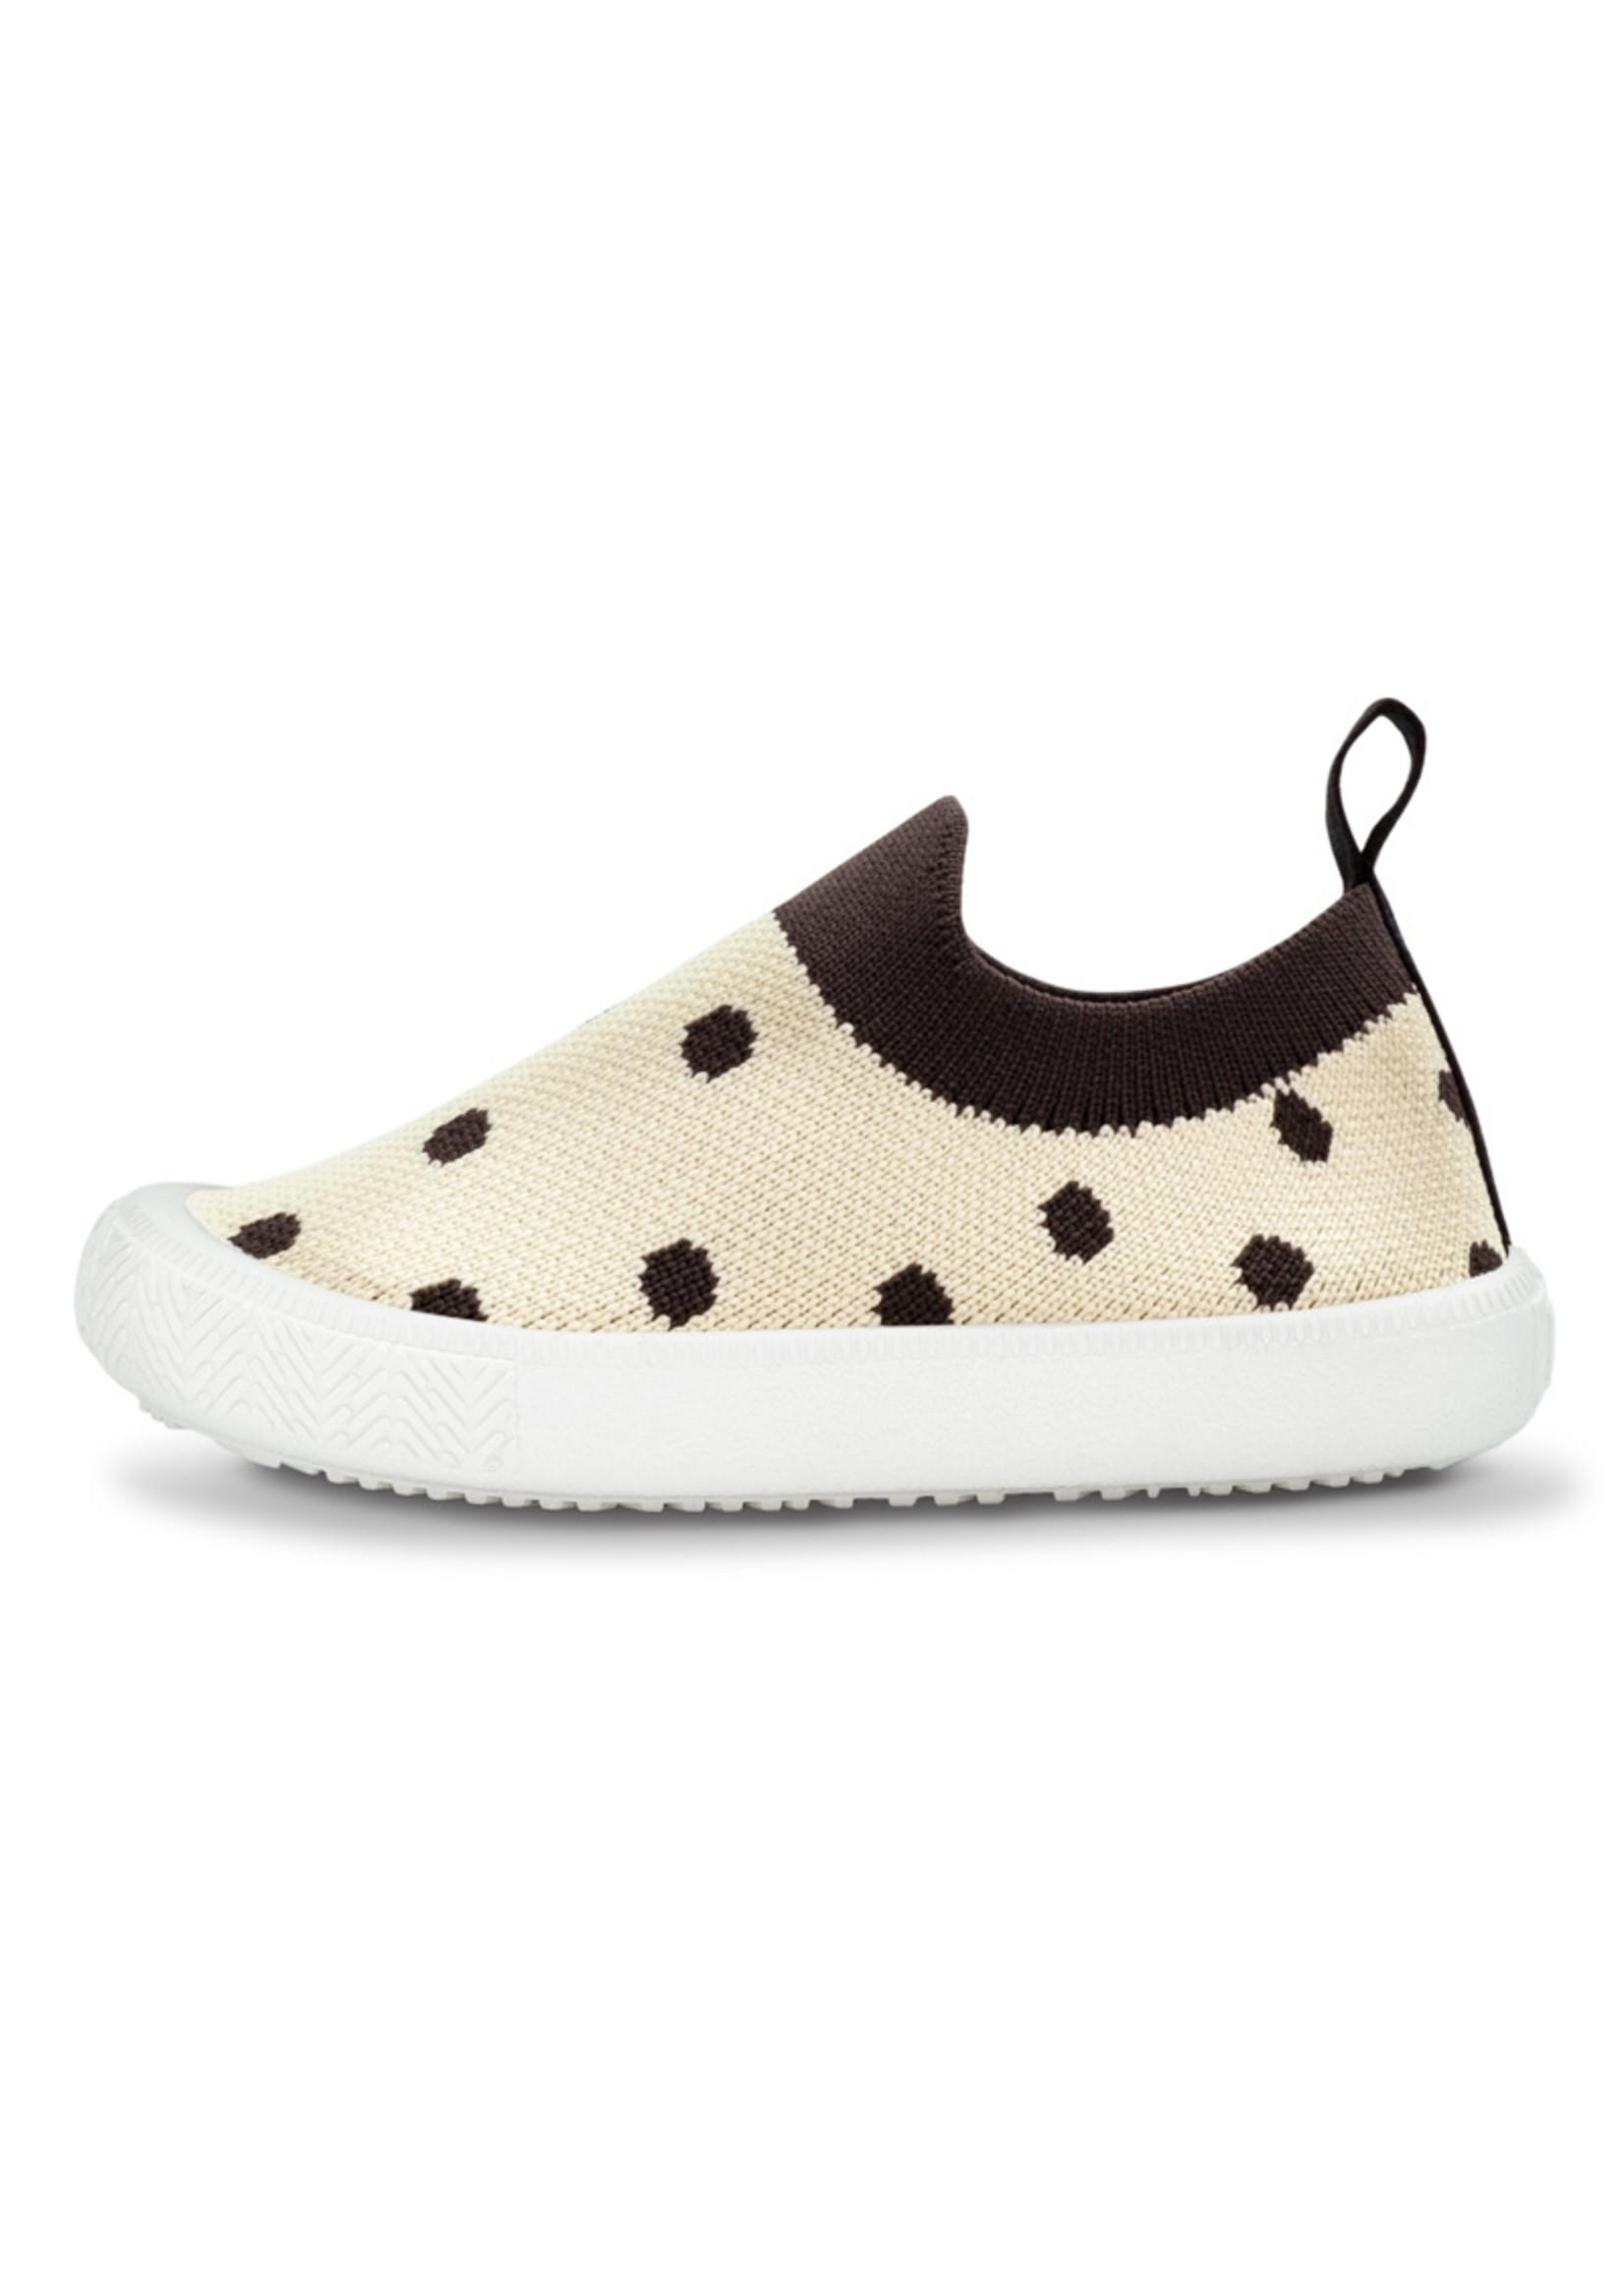 Jan & Jul Chaussure en tricot Xplorer -Dots